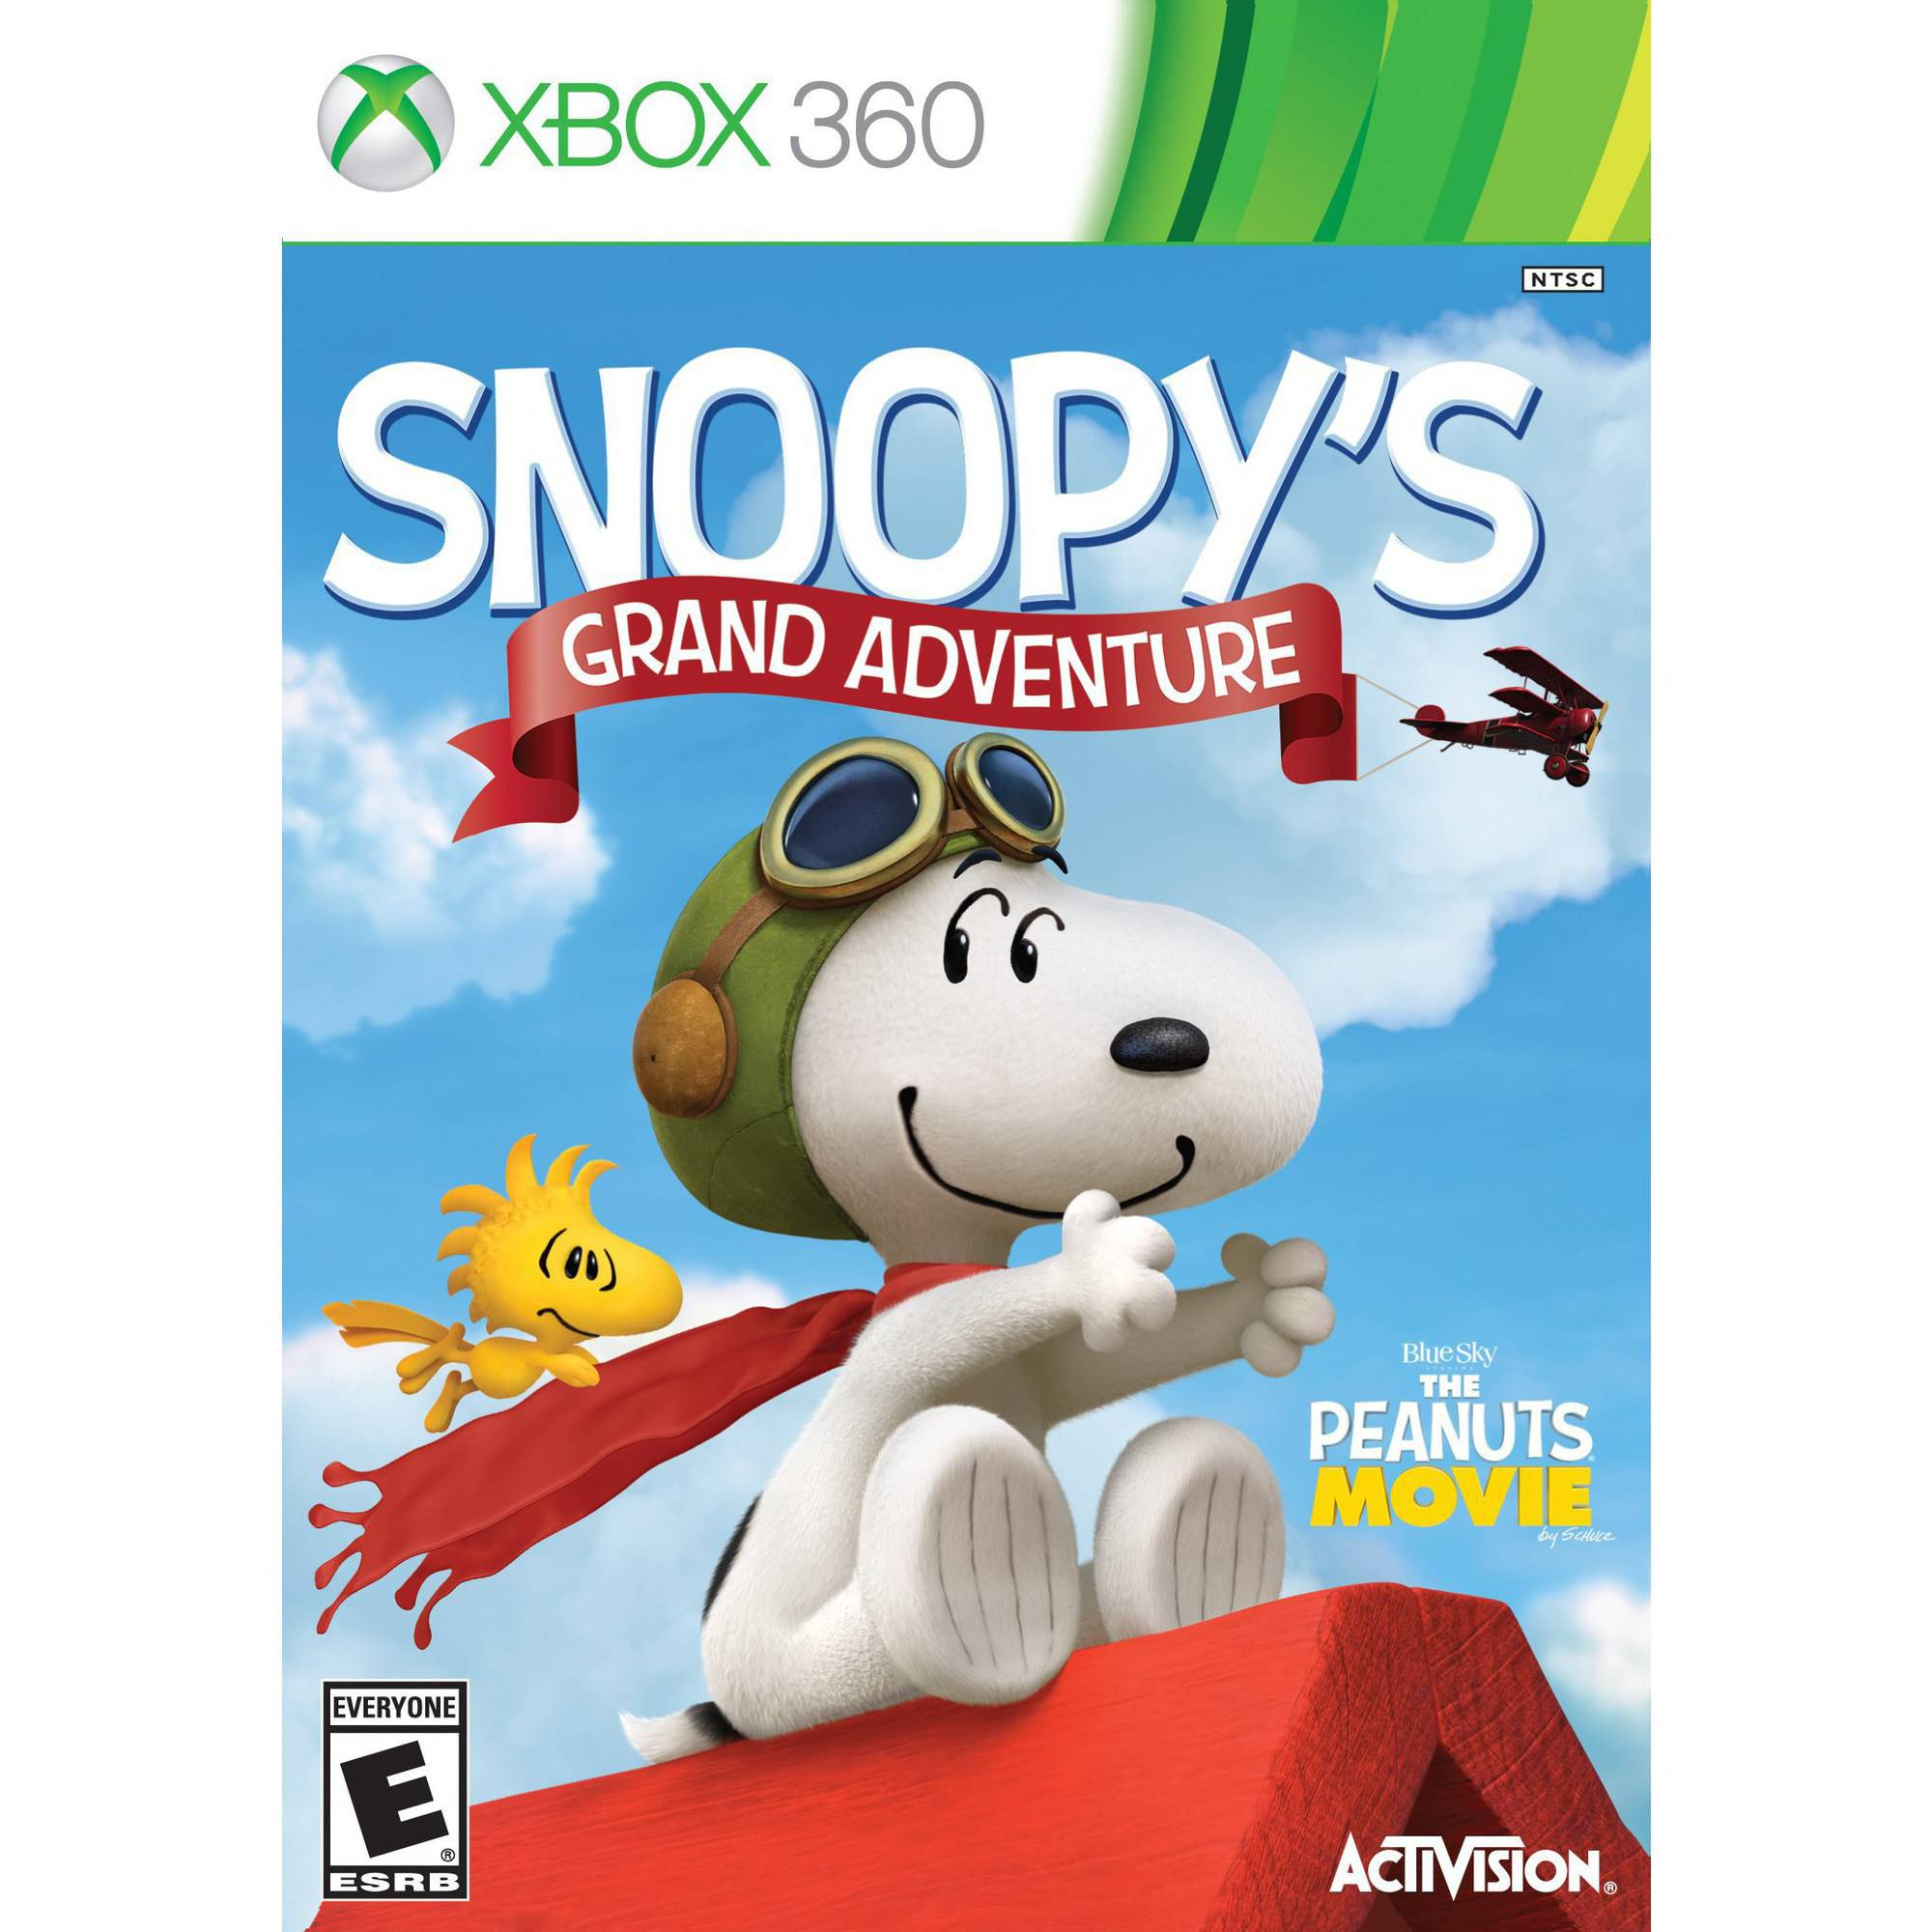 The Peanuts Movie: Snoopy's Grand Adventure (Xbox 360)